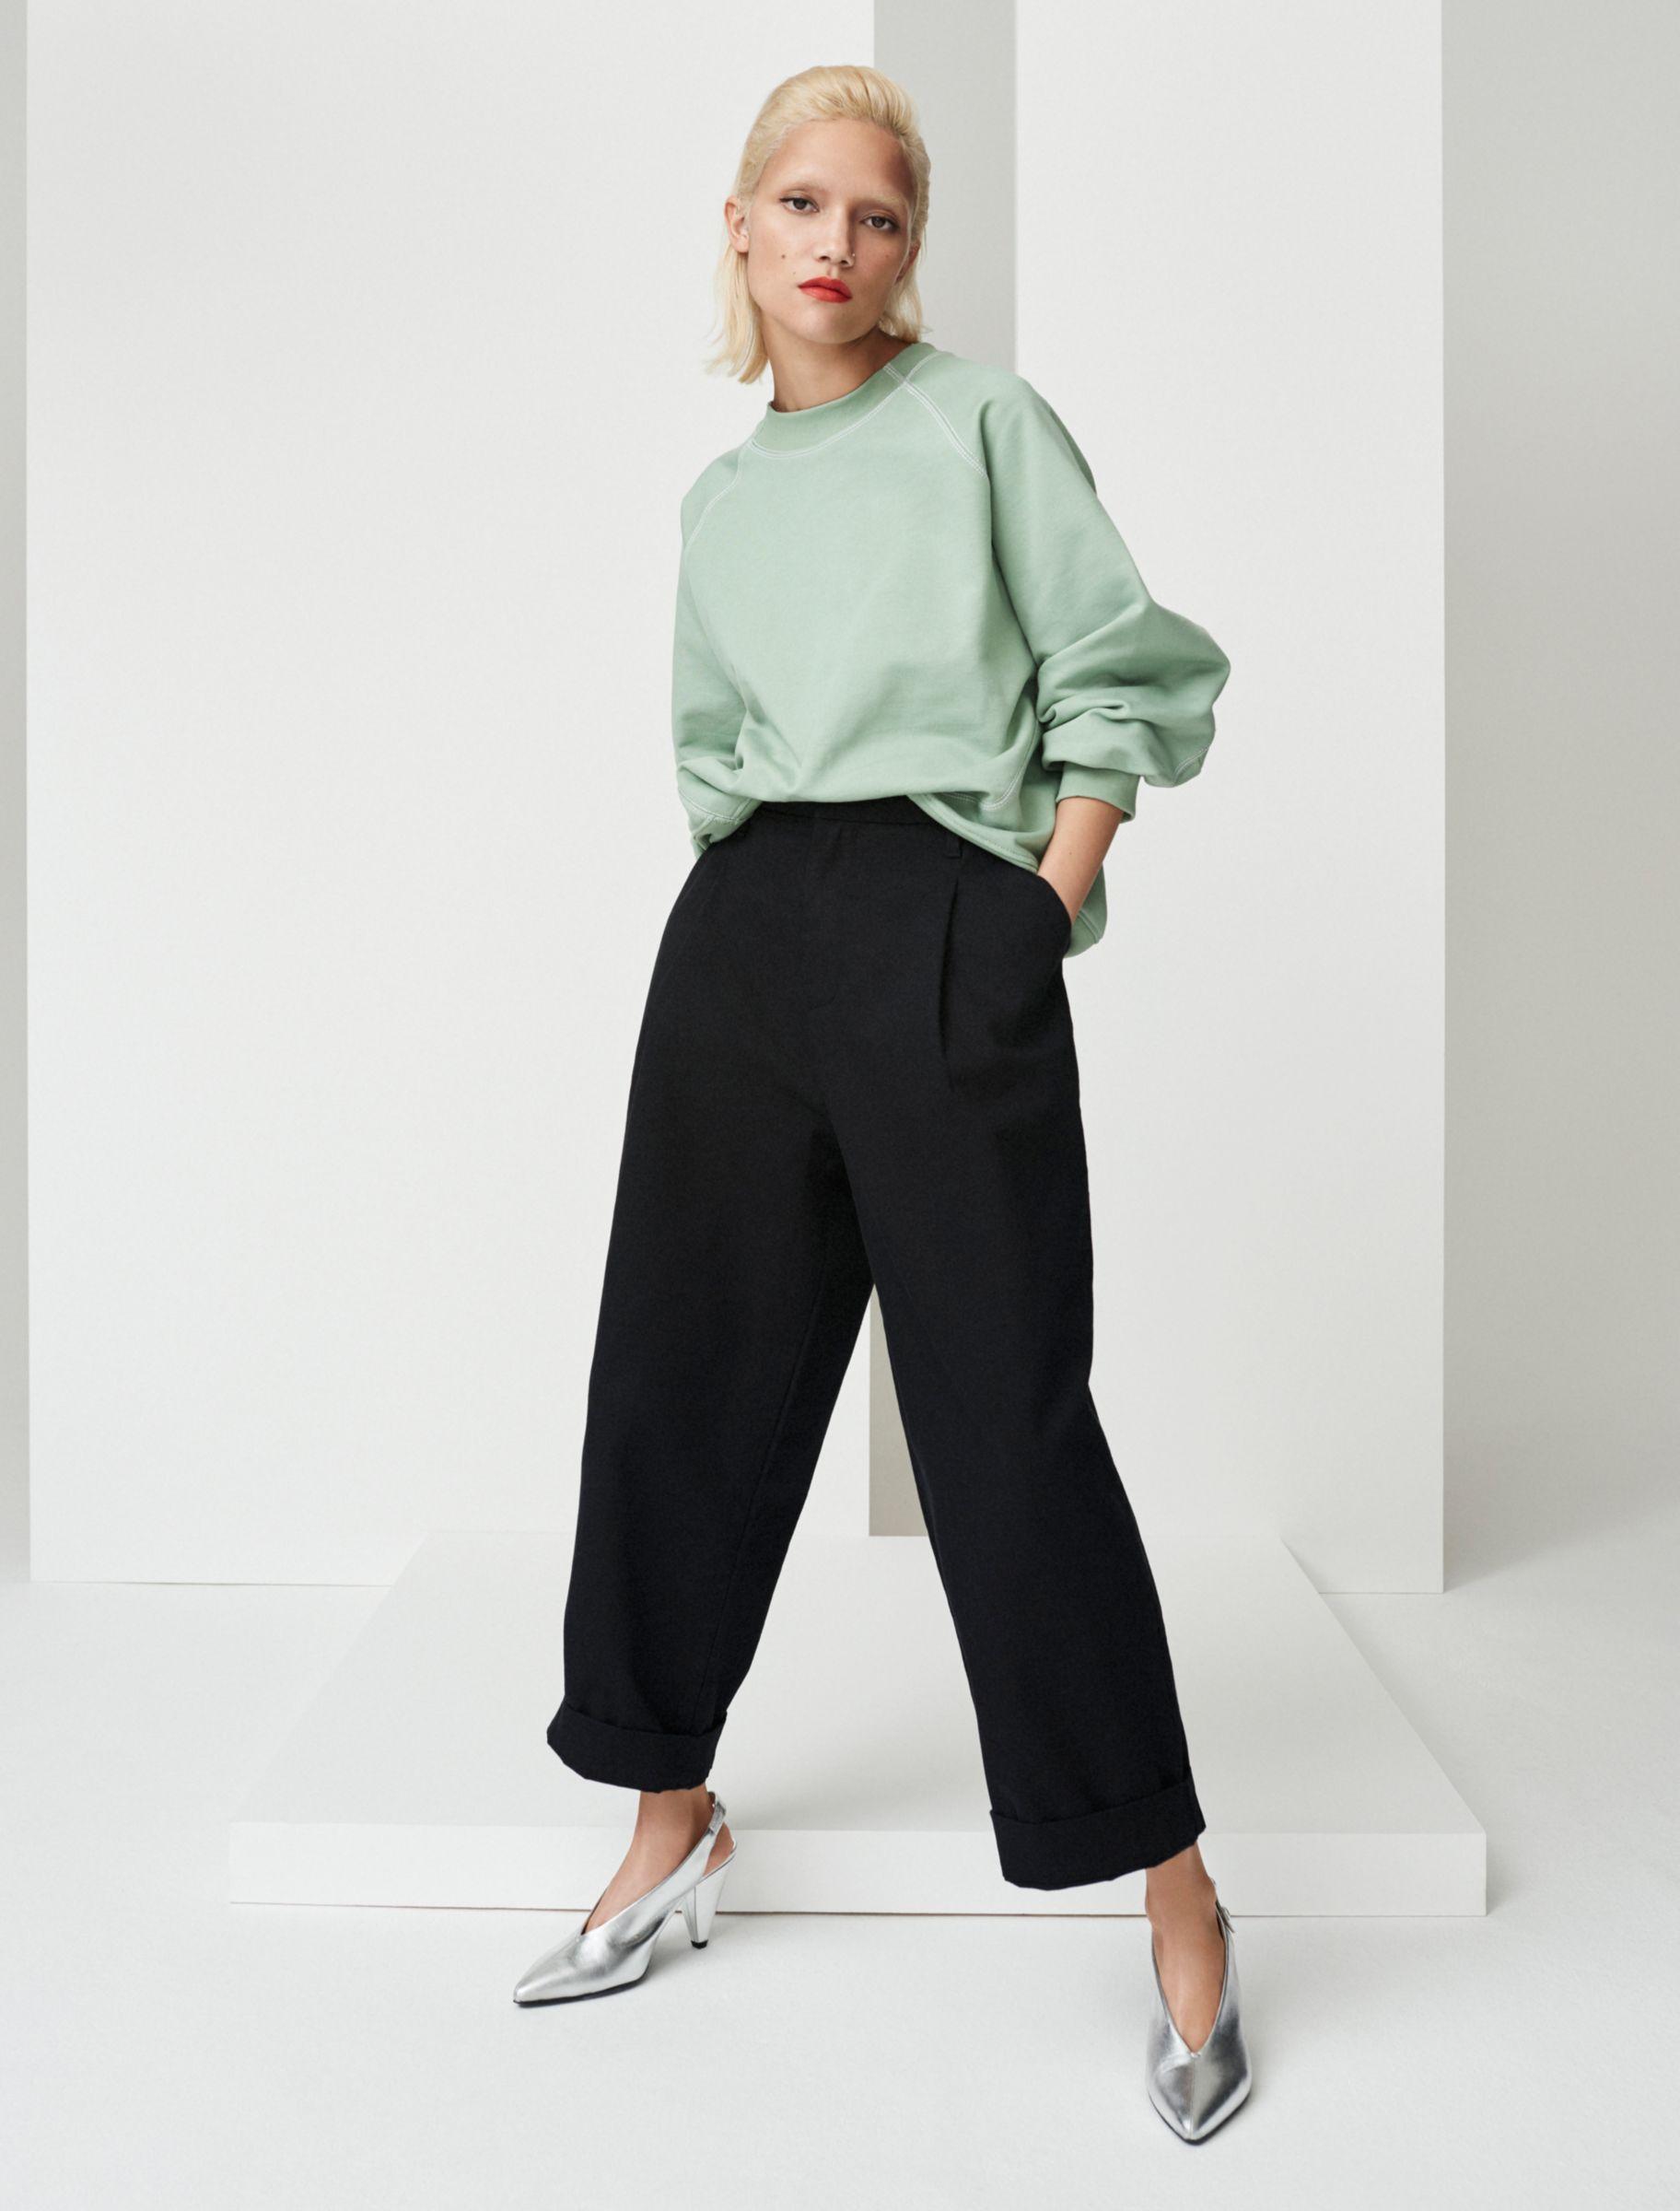 Woman in green jumper